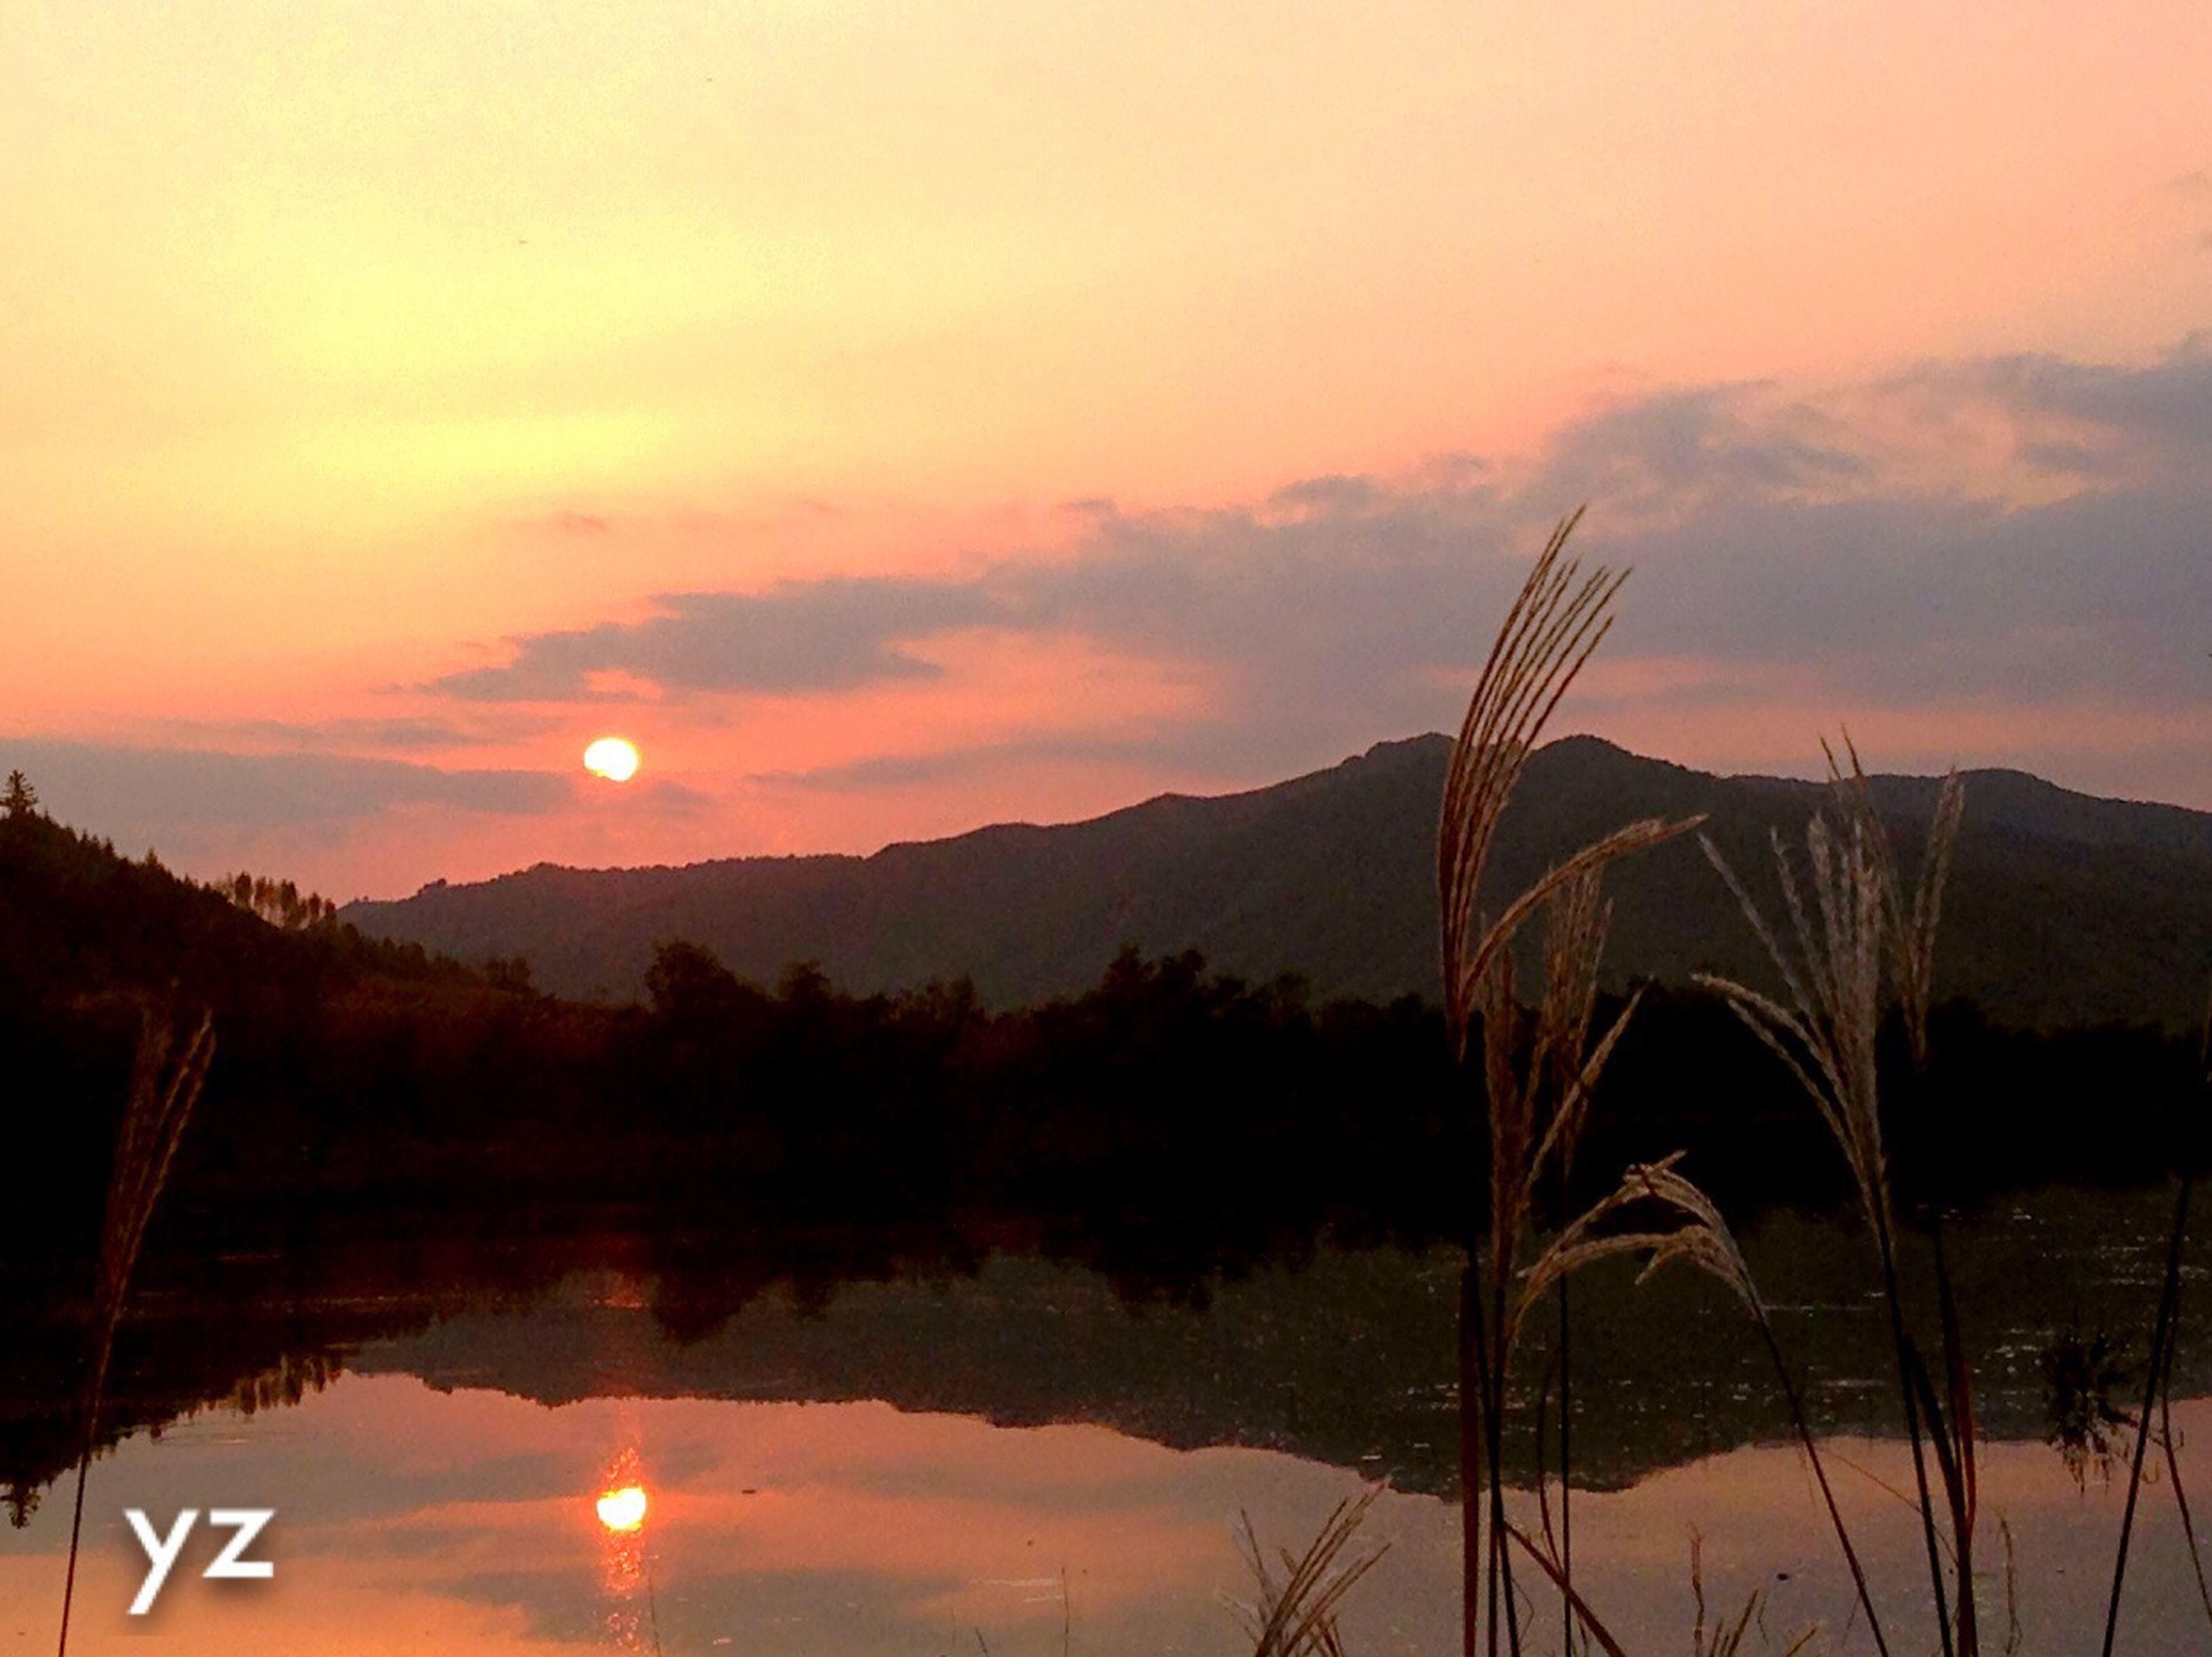 sunset, water, reflection, tranquil scene, tranquility, scenics, lake, sun, beauty in nature, mountain, sky, orange color, nature, waterfront, silhouette, idyllic, tree, non-urban scene, river, mountain range